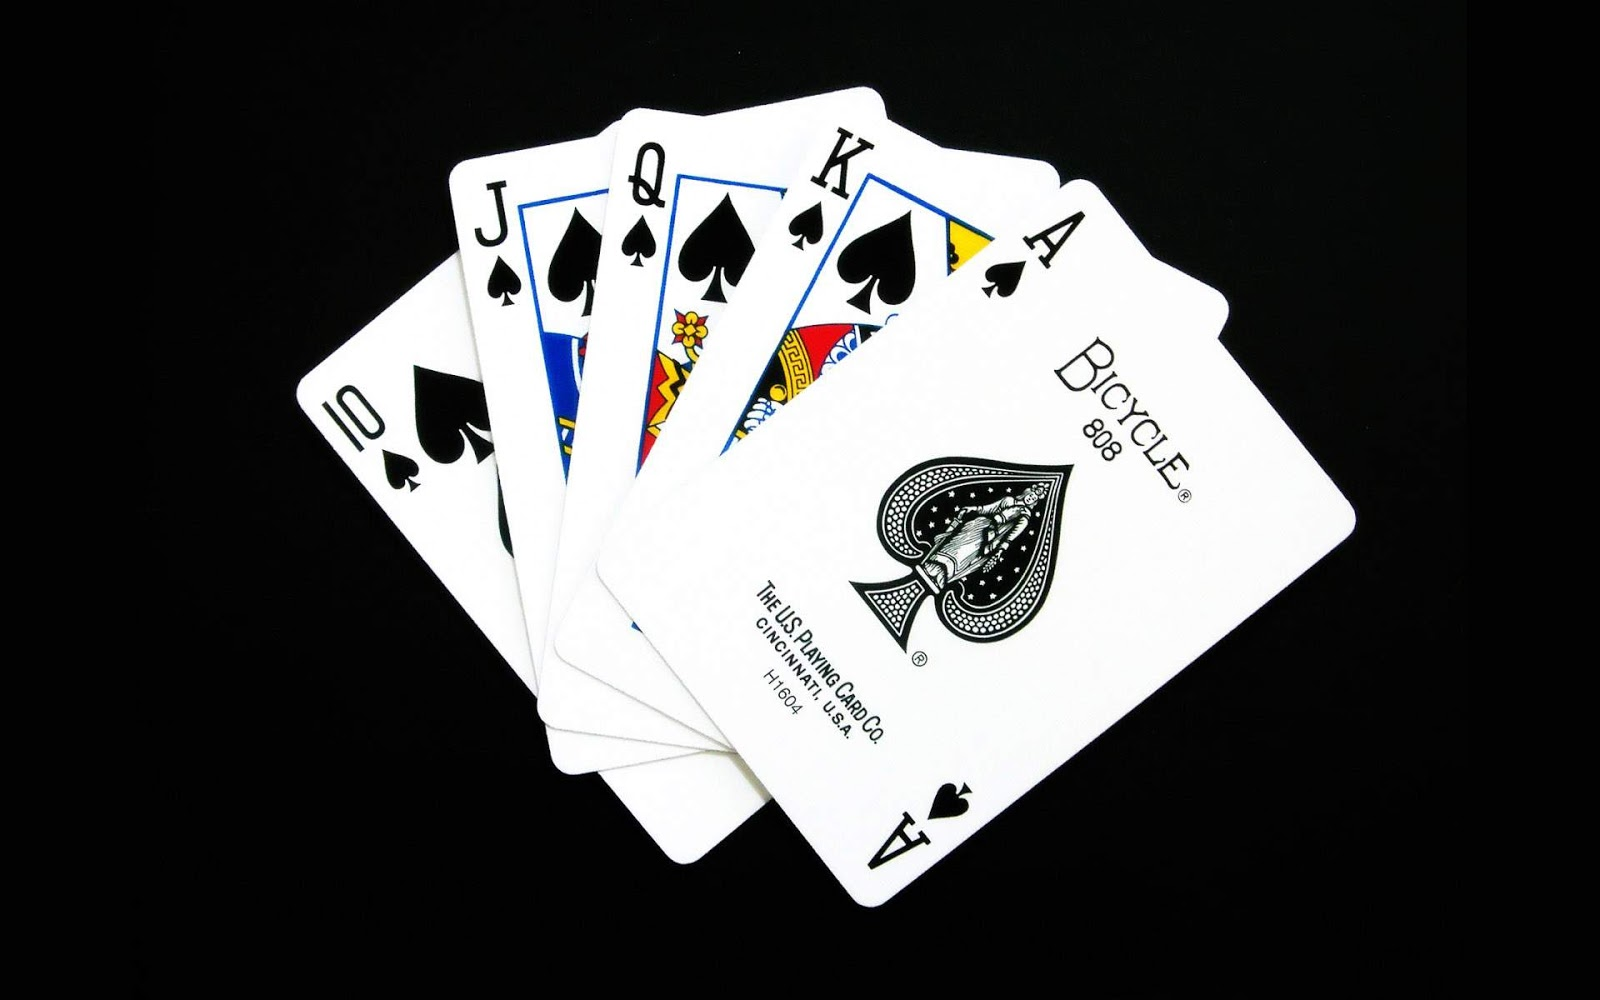 http://4.bp.blogspot.com/-9HHzZcJY828/UI6j1VH8rUI/AAAAAAAABFQ/ta2PmH4bIHA/s1600/Game-cards-on-black-background-black-and-white-wallpaper-hd-widescreen.jpg